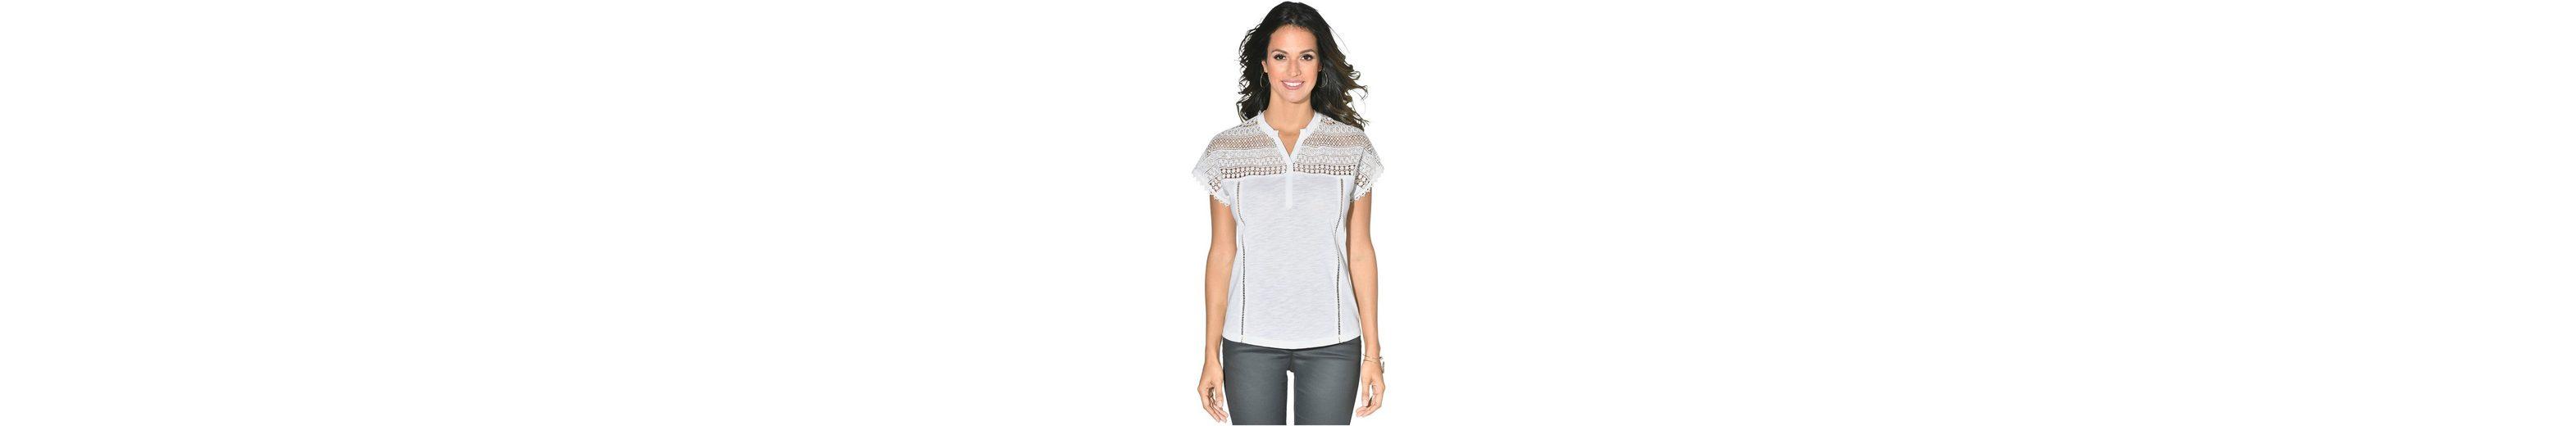 Classic Shirt Schulterbereich Inspirationen Classic Inspirationen mit Spitze im 5xa5zwq